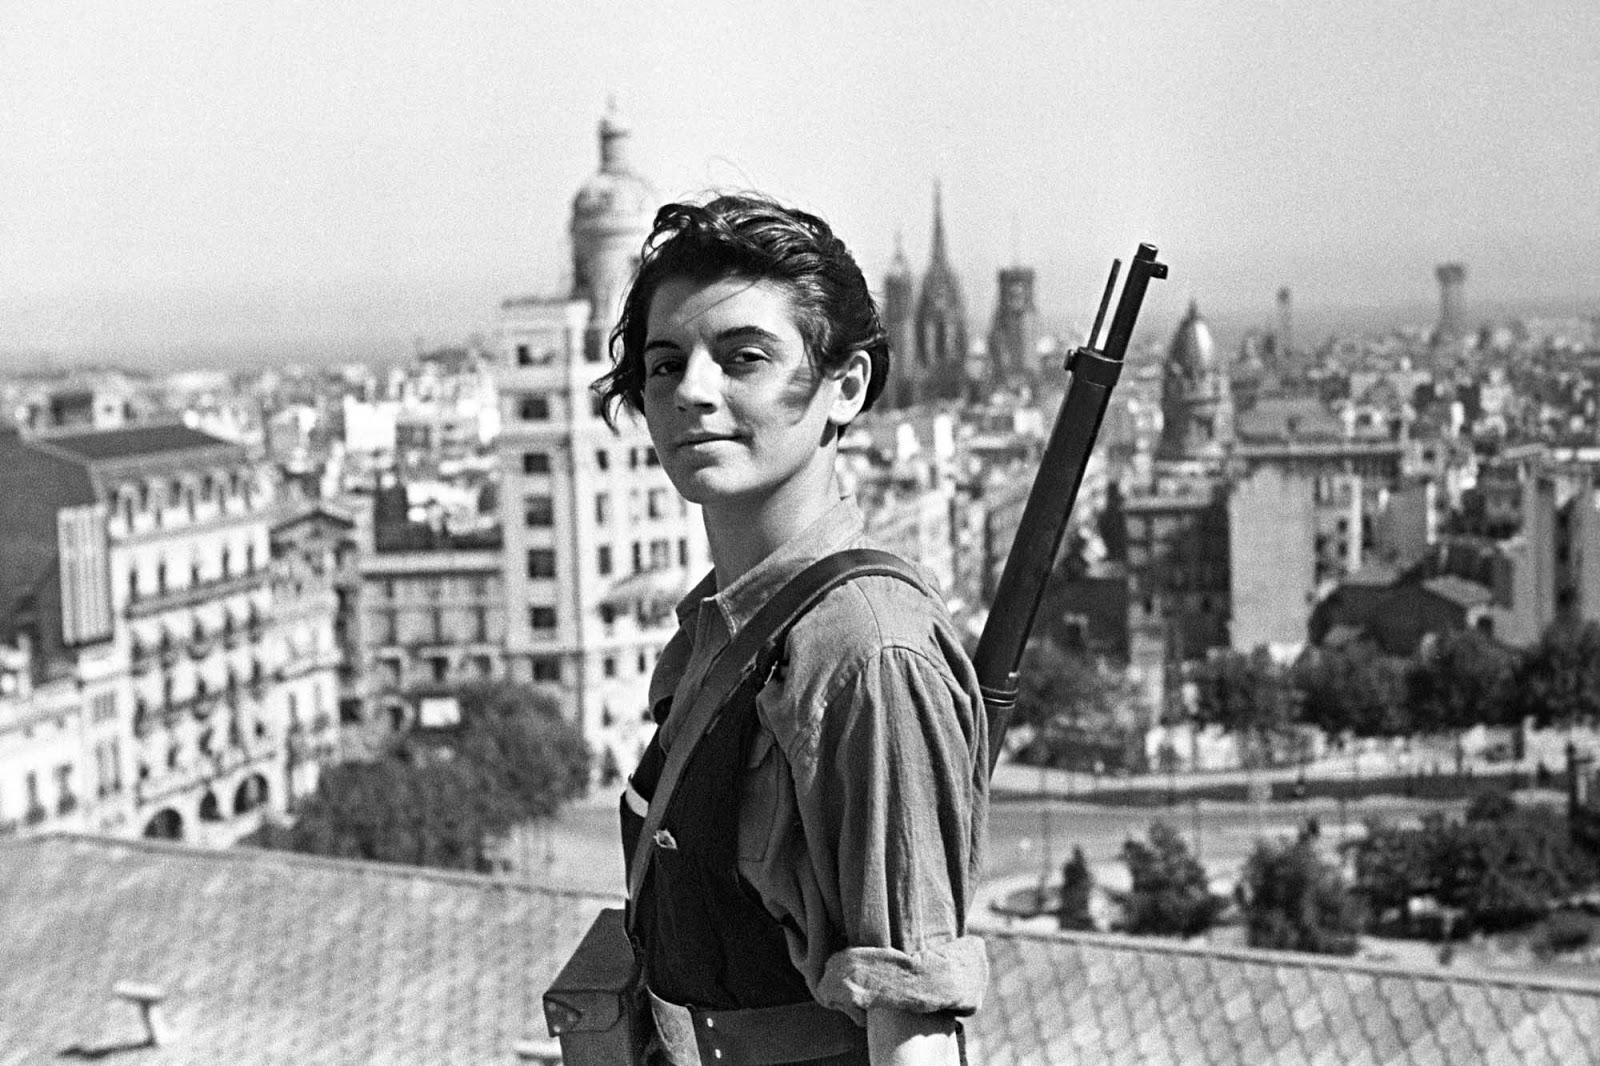 İspanya İç Savaşı'nın ikonik fotoğraflarından, Marina Ginestà